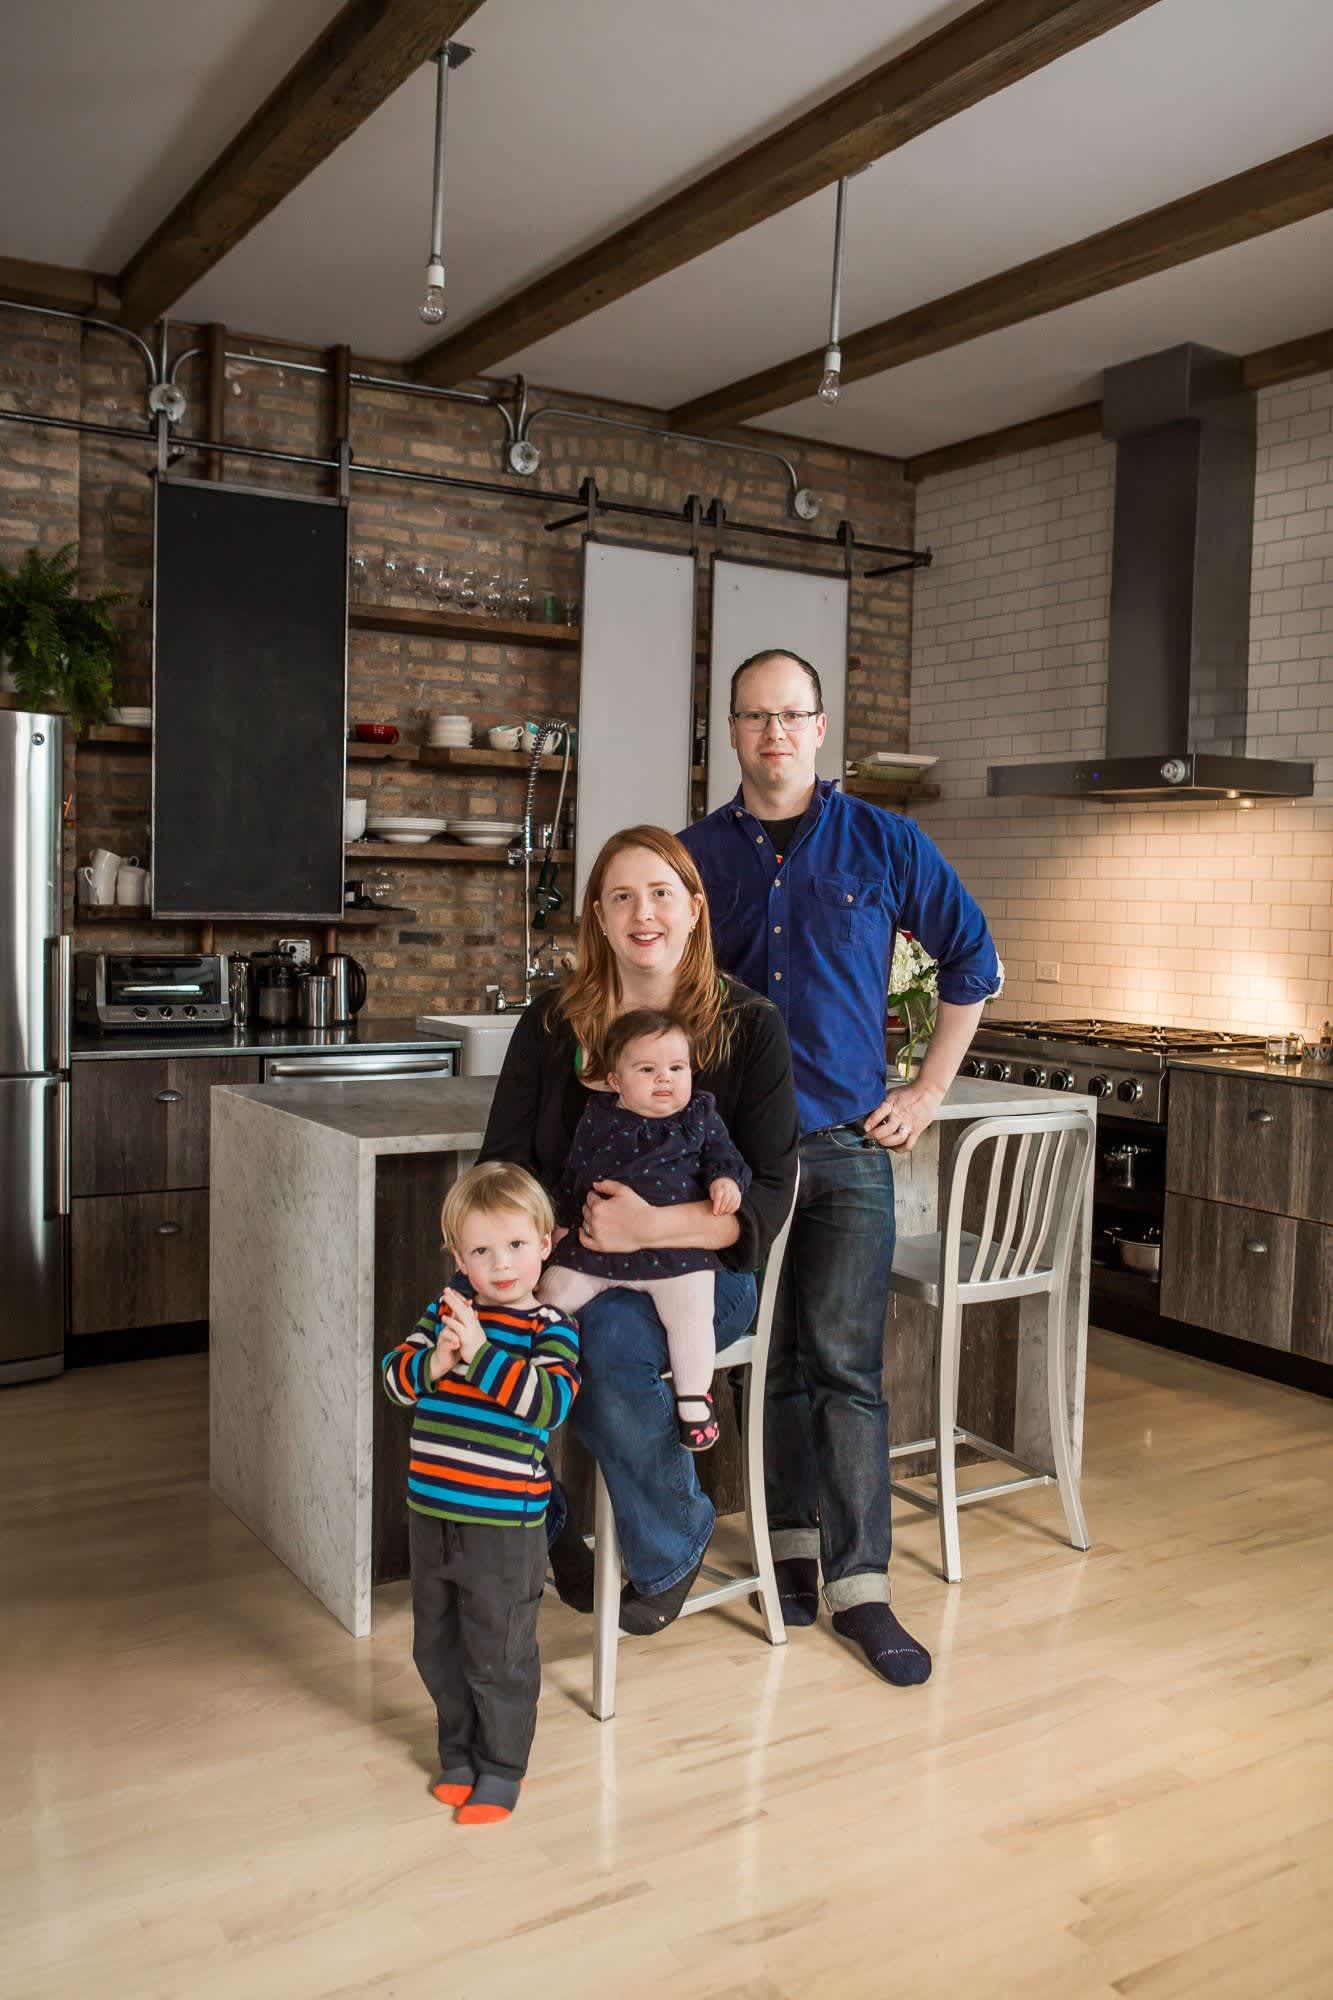 Ellen & Greg's Renovated Loft Kitchen: gallery image 1